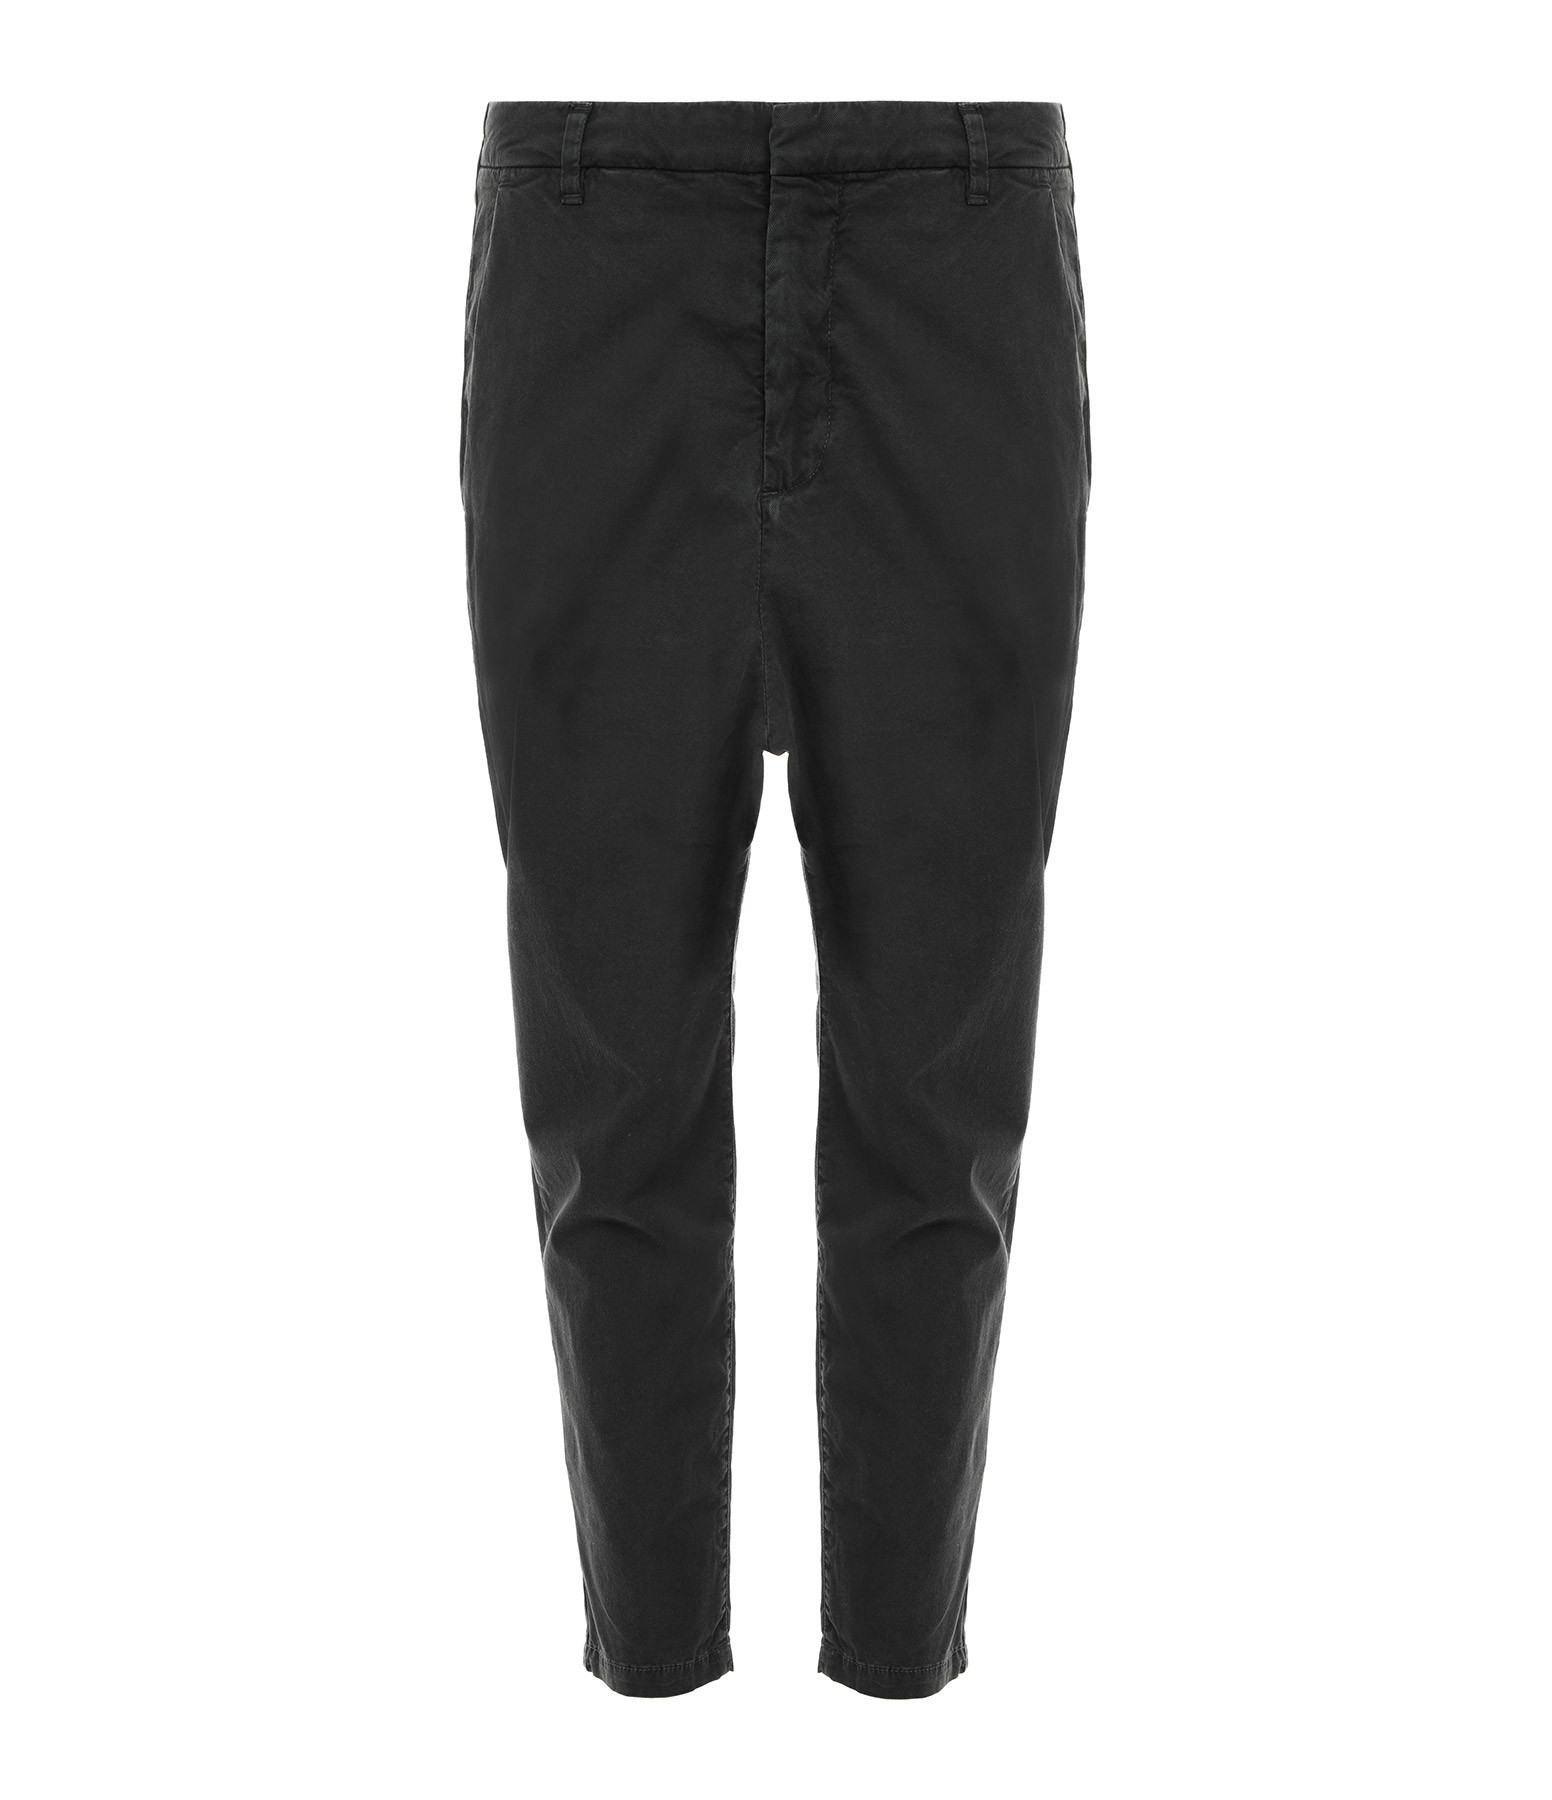 NILI LOTAN - Pantalon Paris Noir Délavé